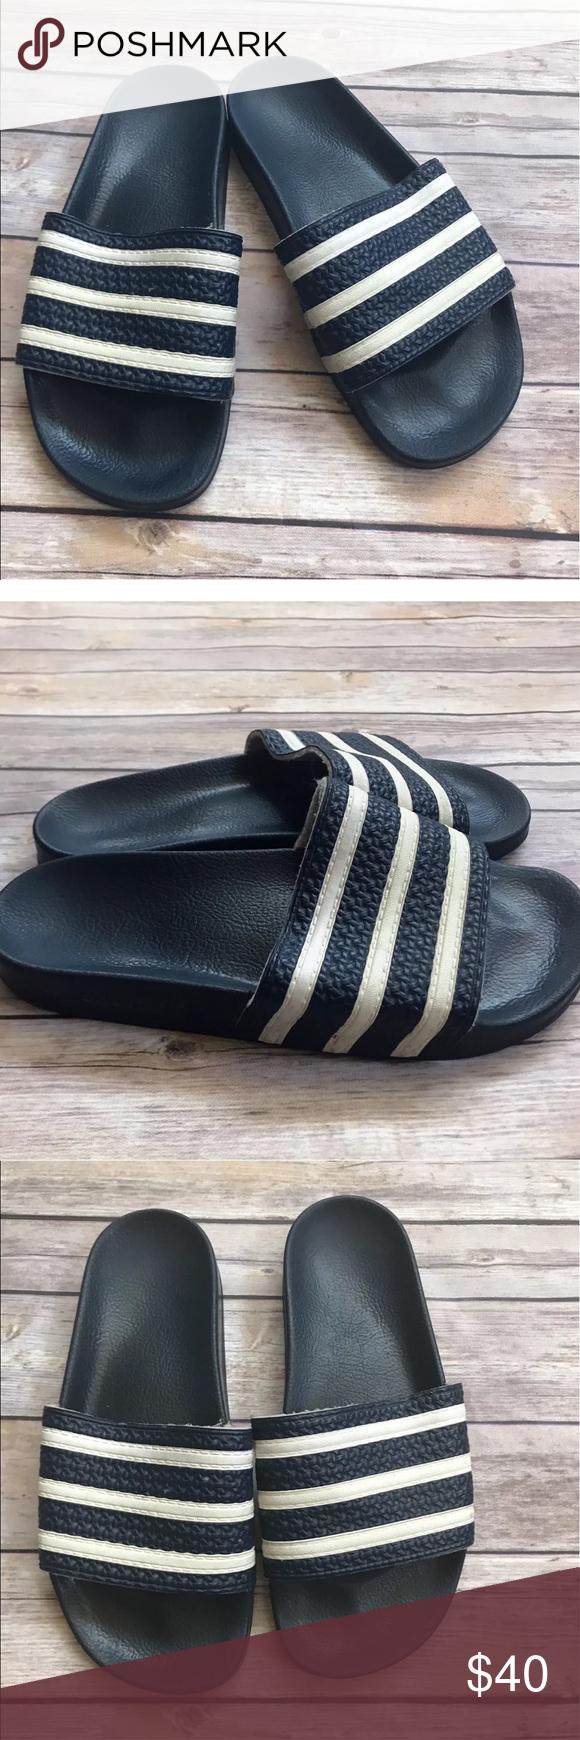 91d15534c Vintage ADIDAS Slides sandals adilette Italy blue HI